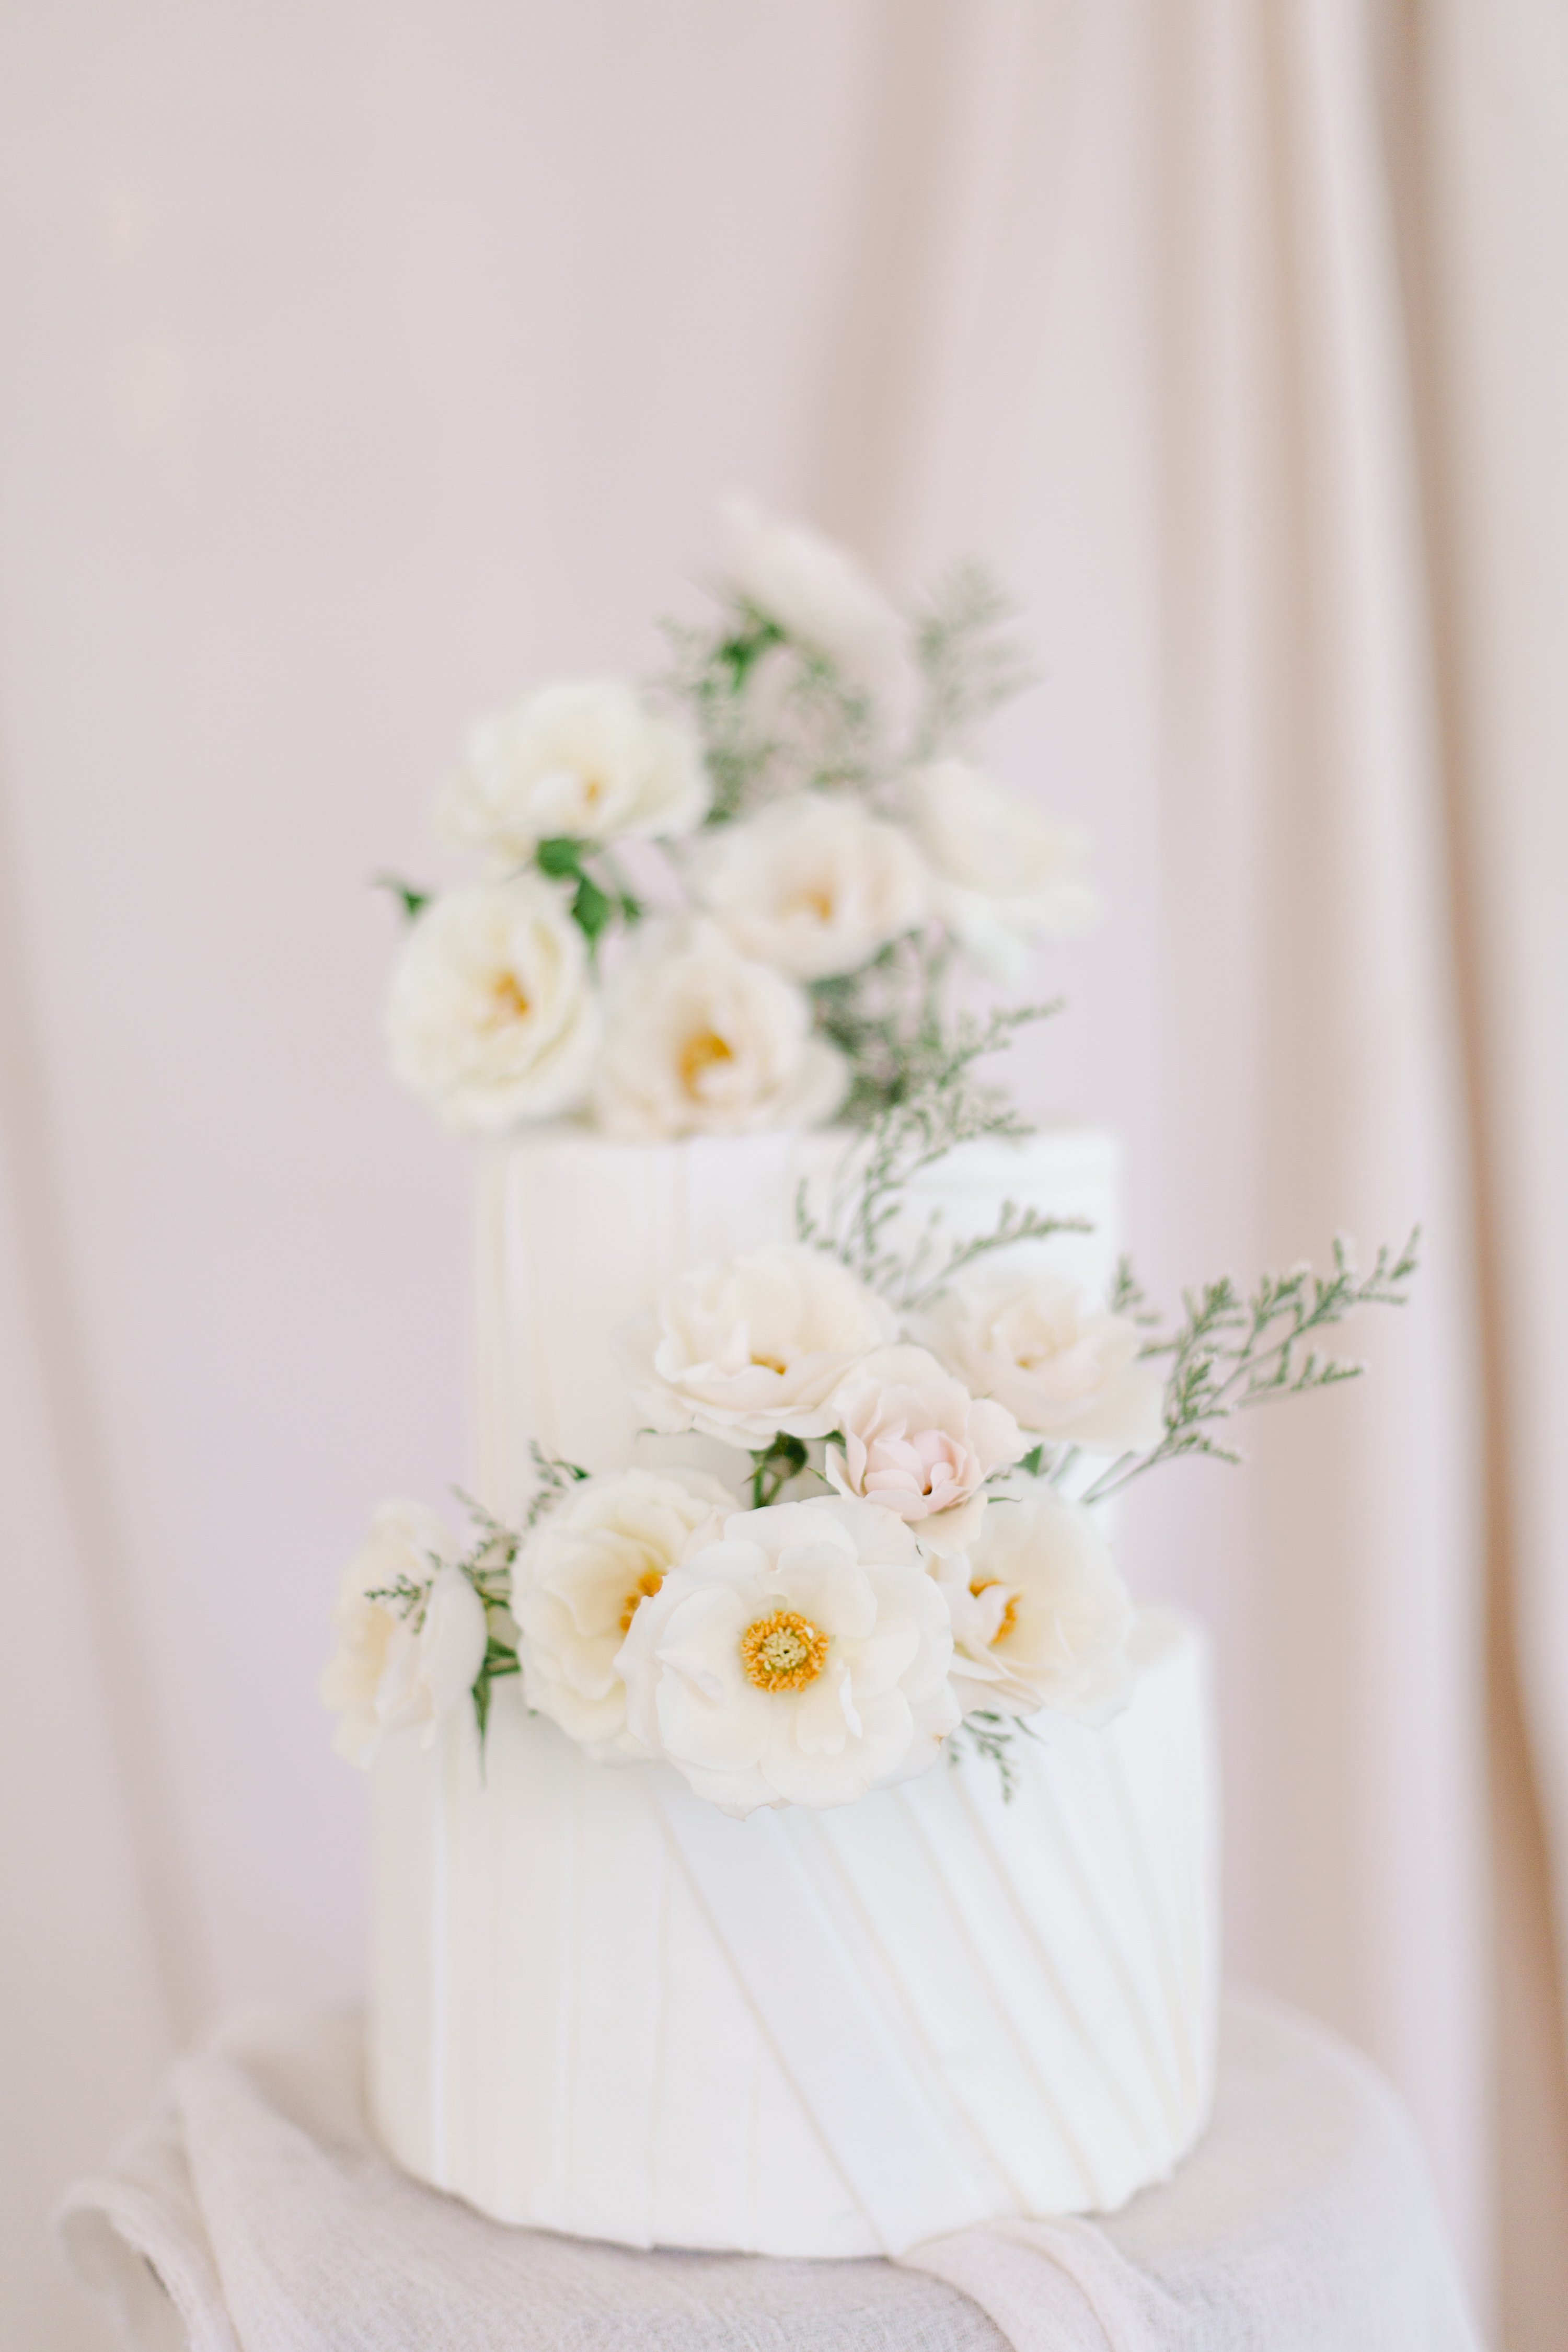 White wedding cake by Cake House Niagara